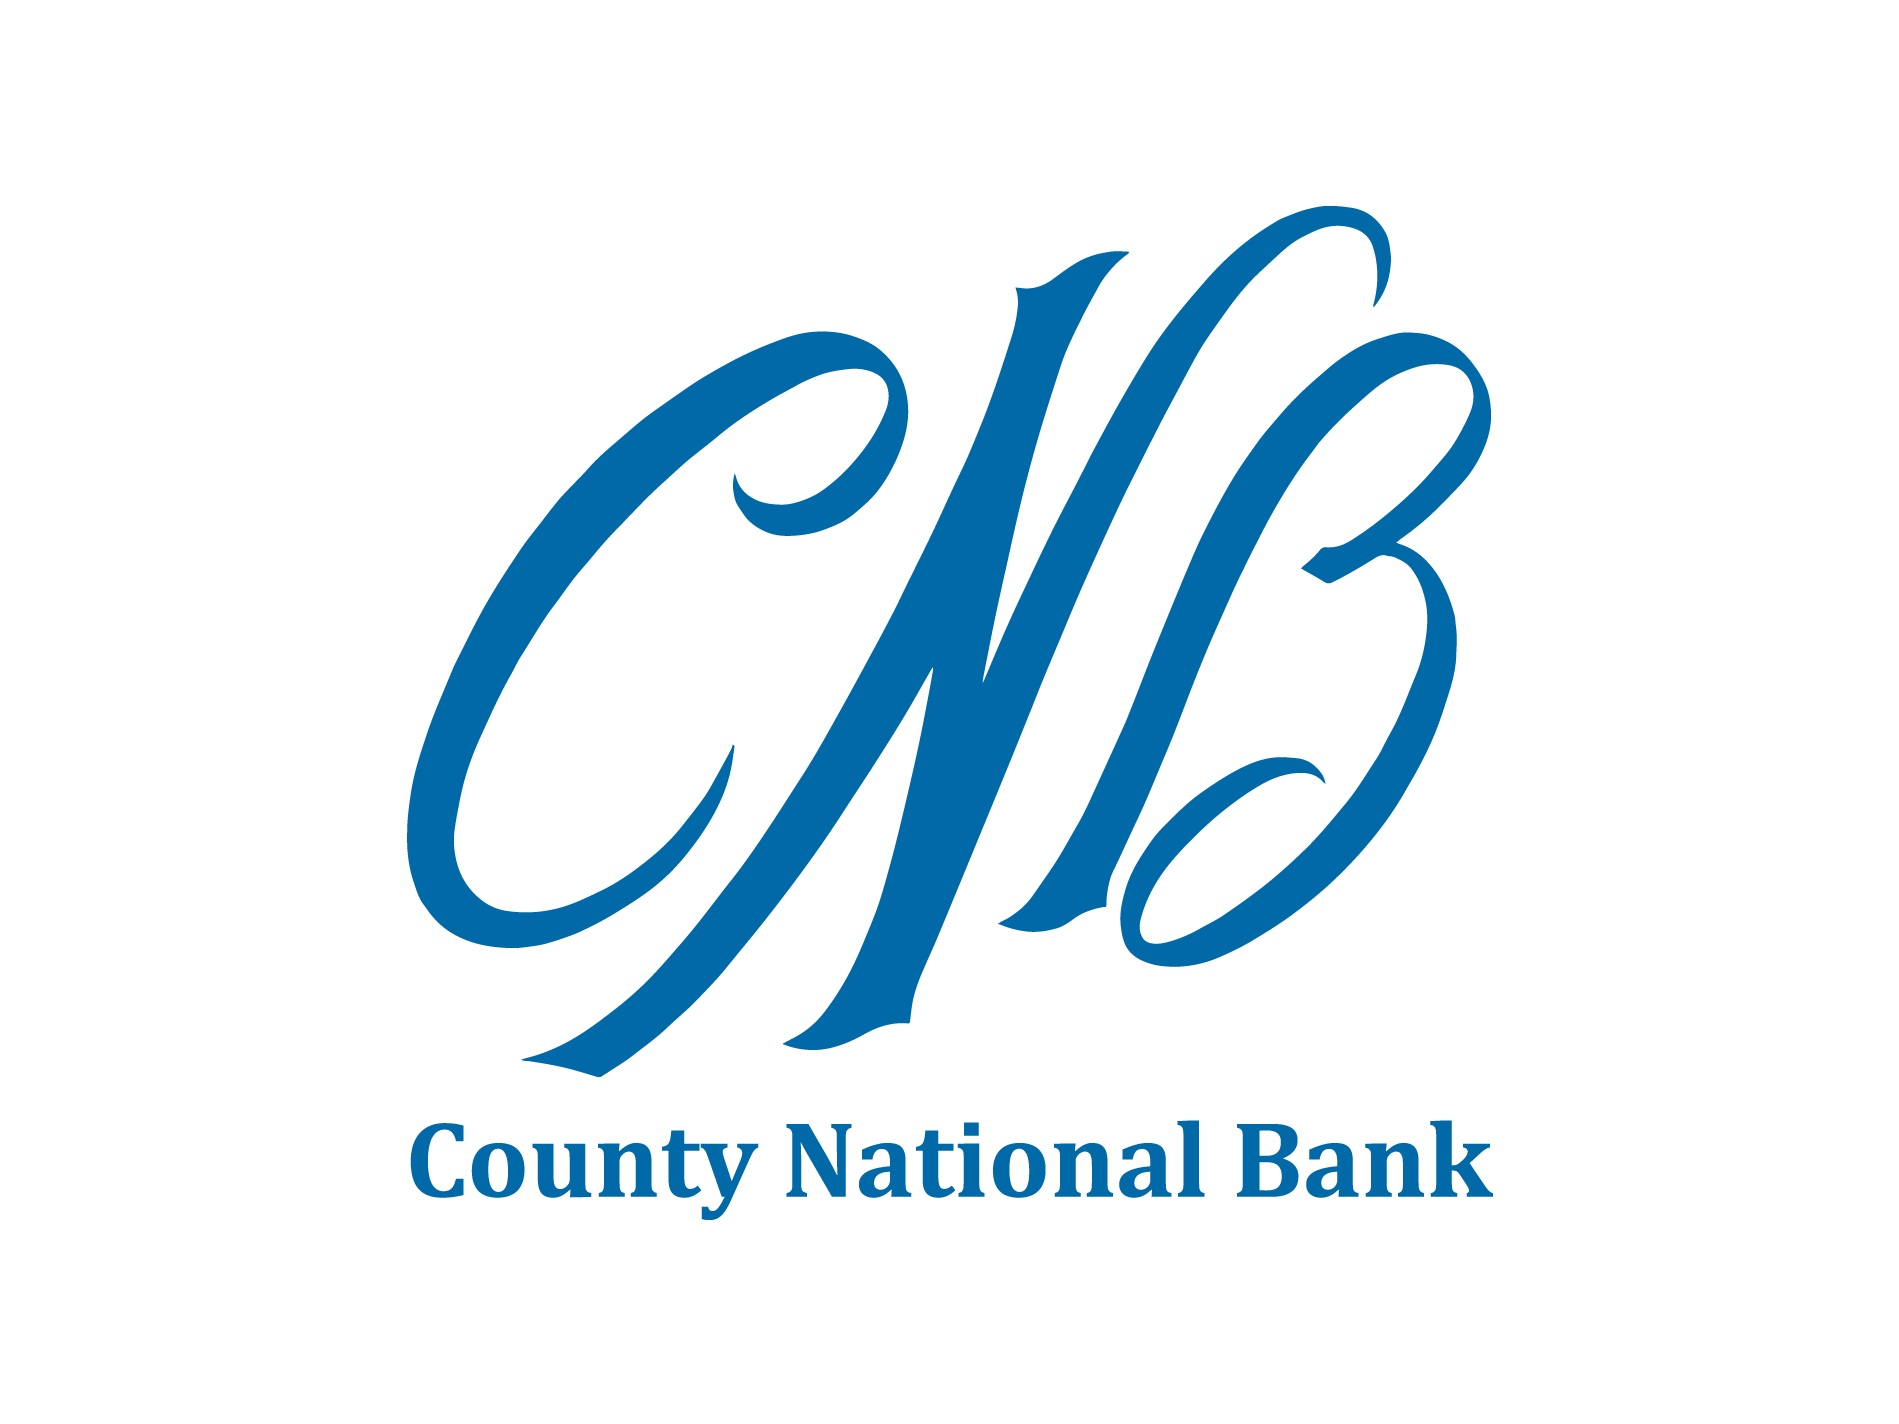 County National Bank